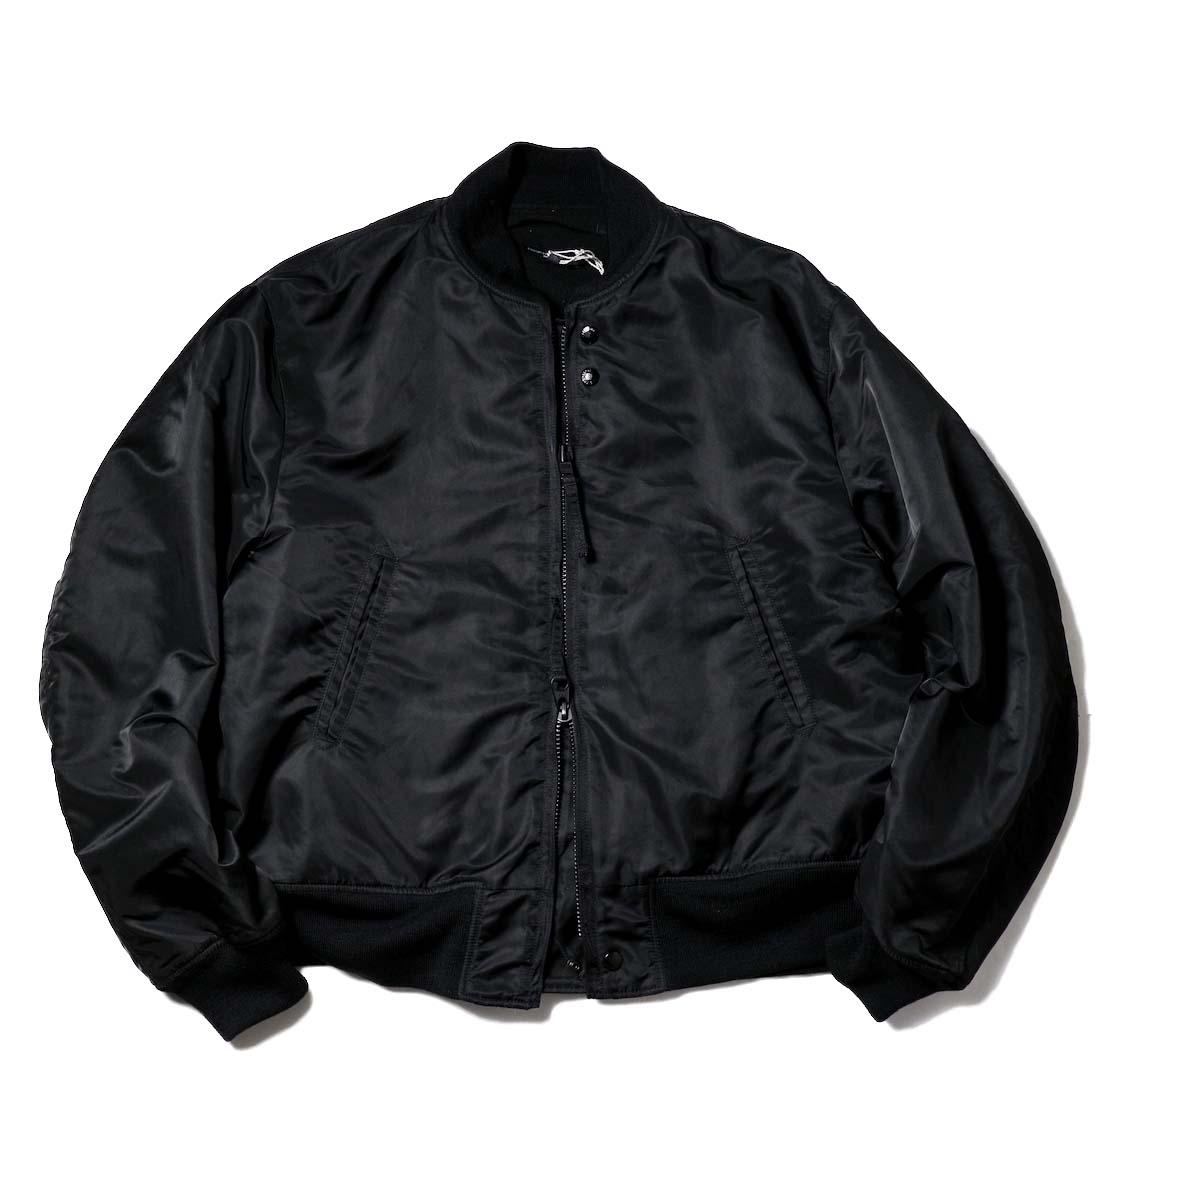 Engineered Garments / SVR Jacket - Flight Satin (Black)